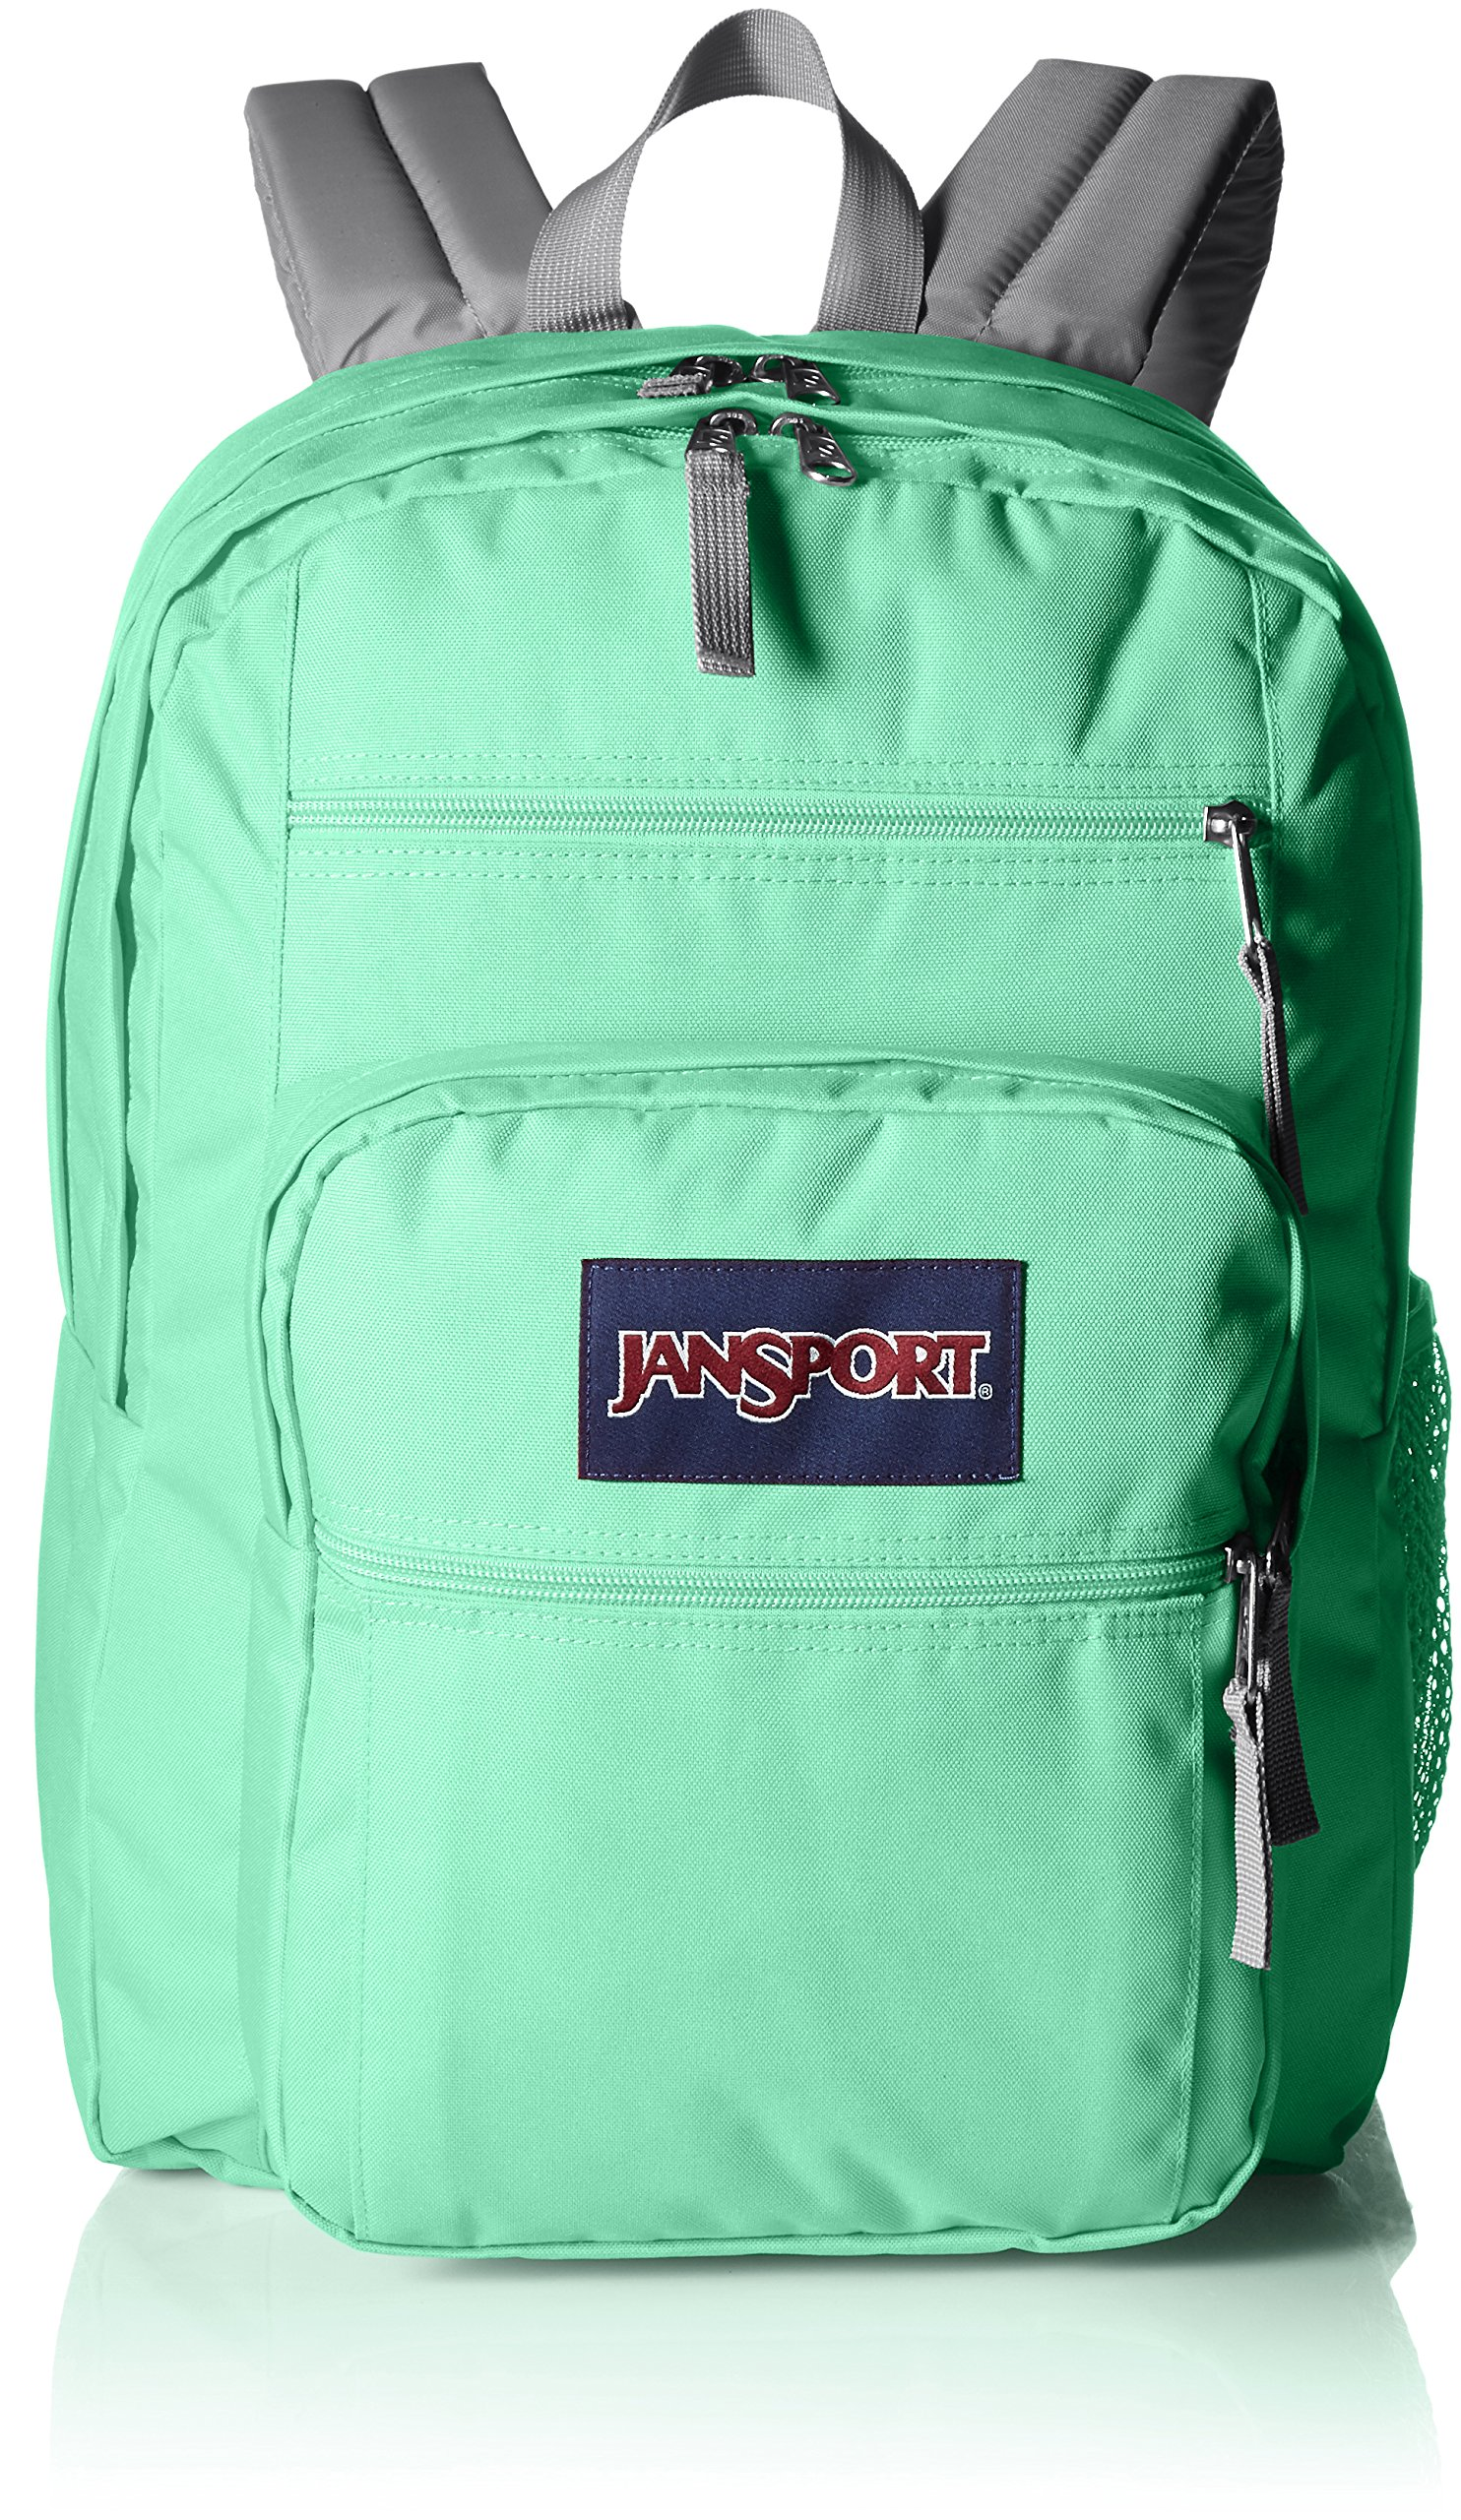 JanSport Big Student Classics Series Backpack (Seafoam Green)